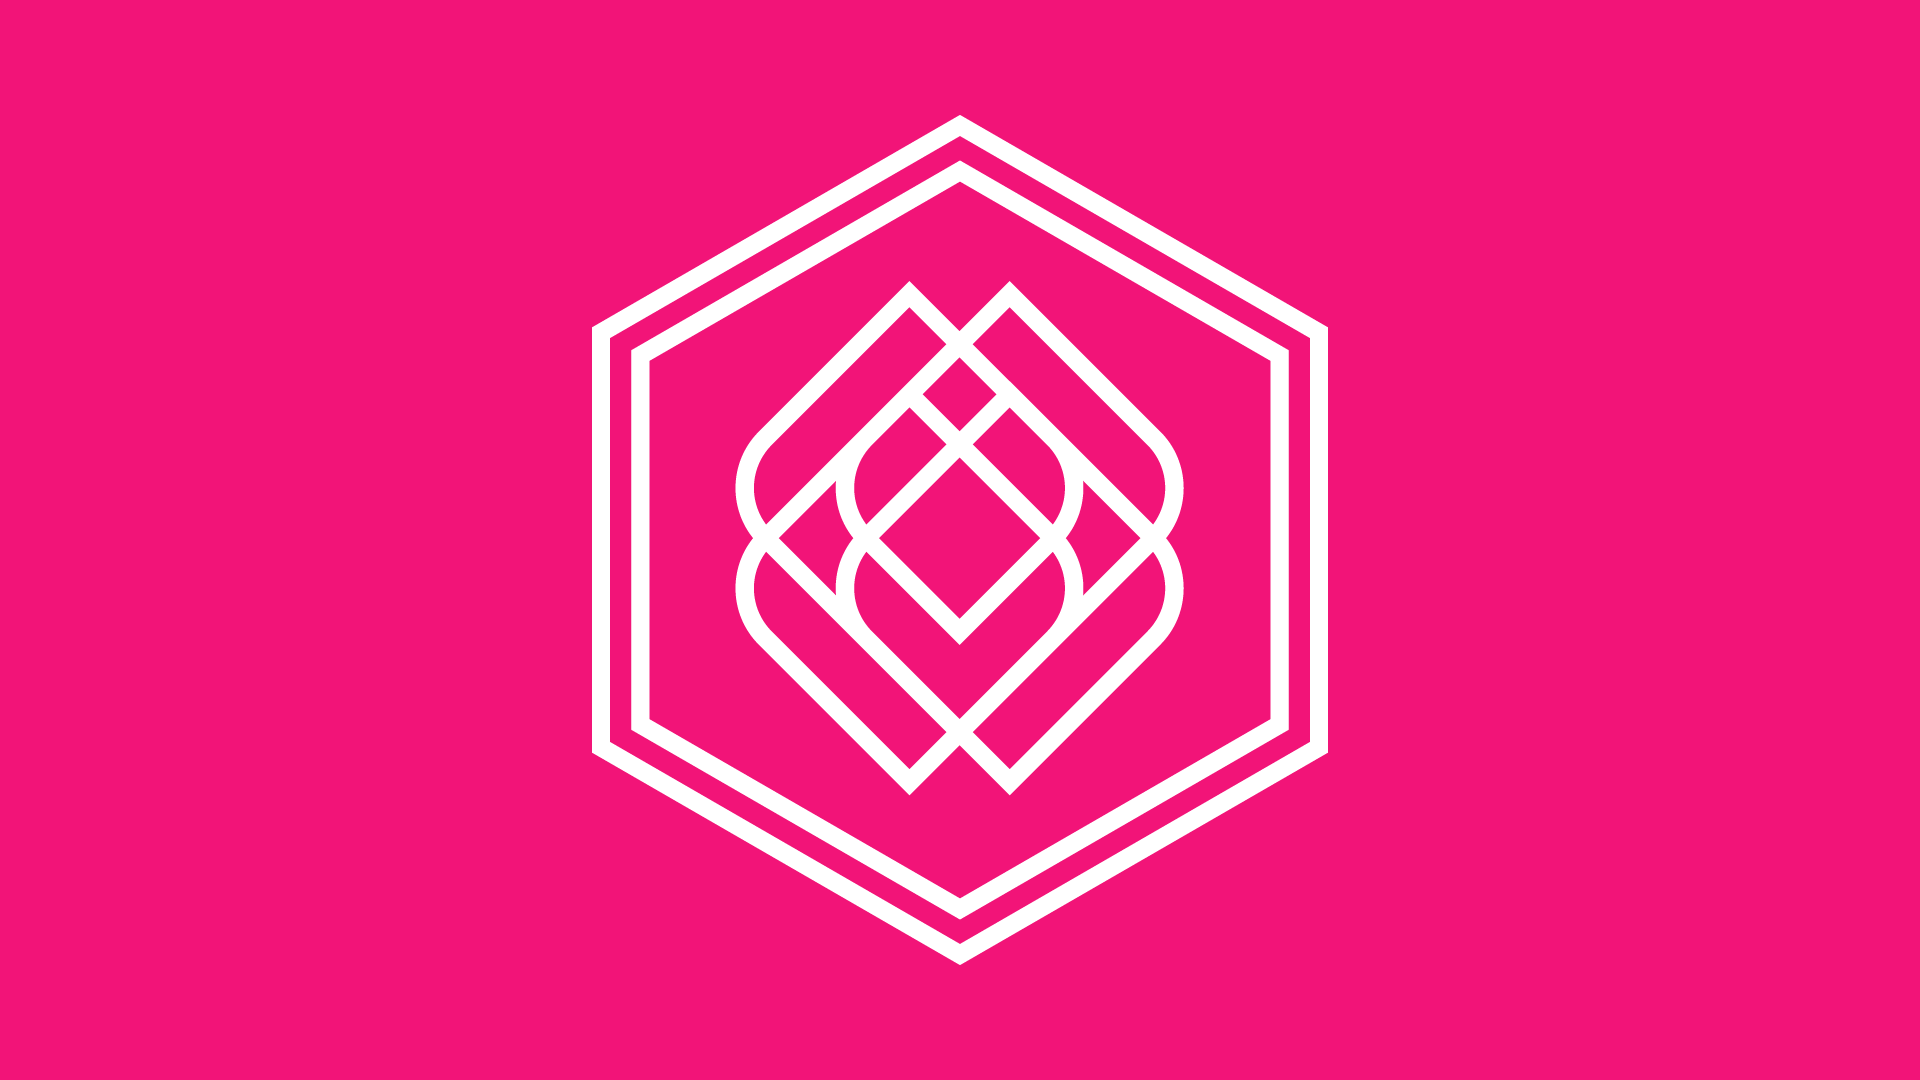 EWC-White-pink-01.png